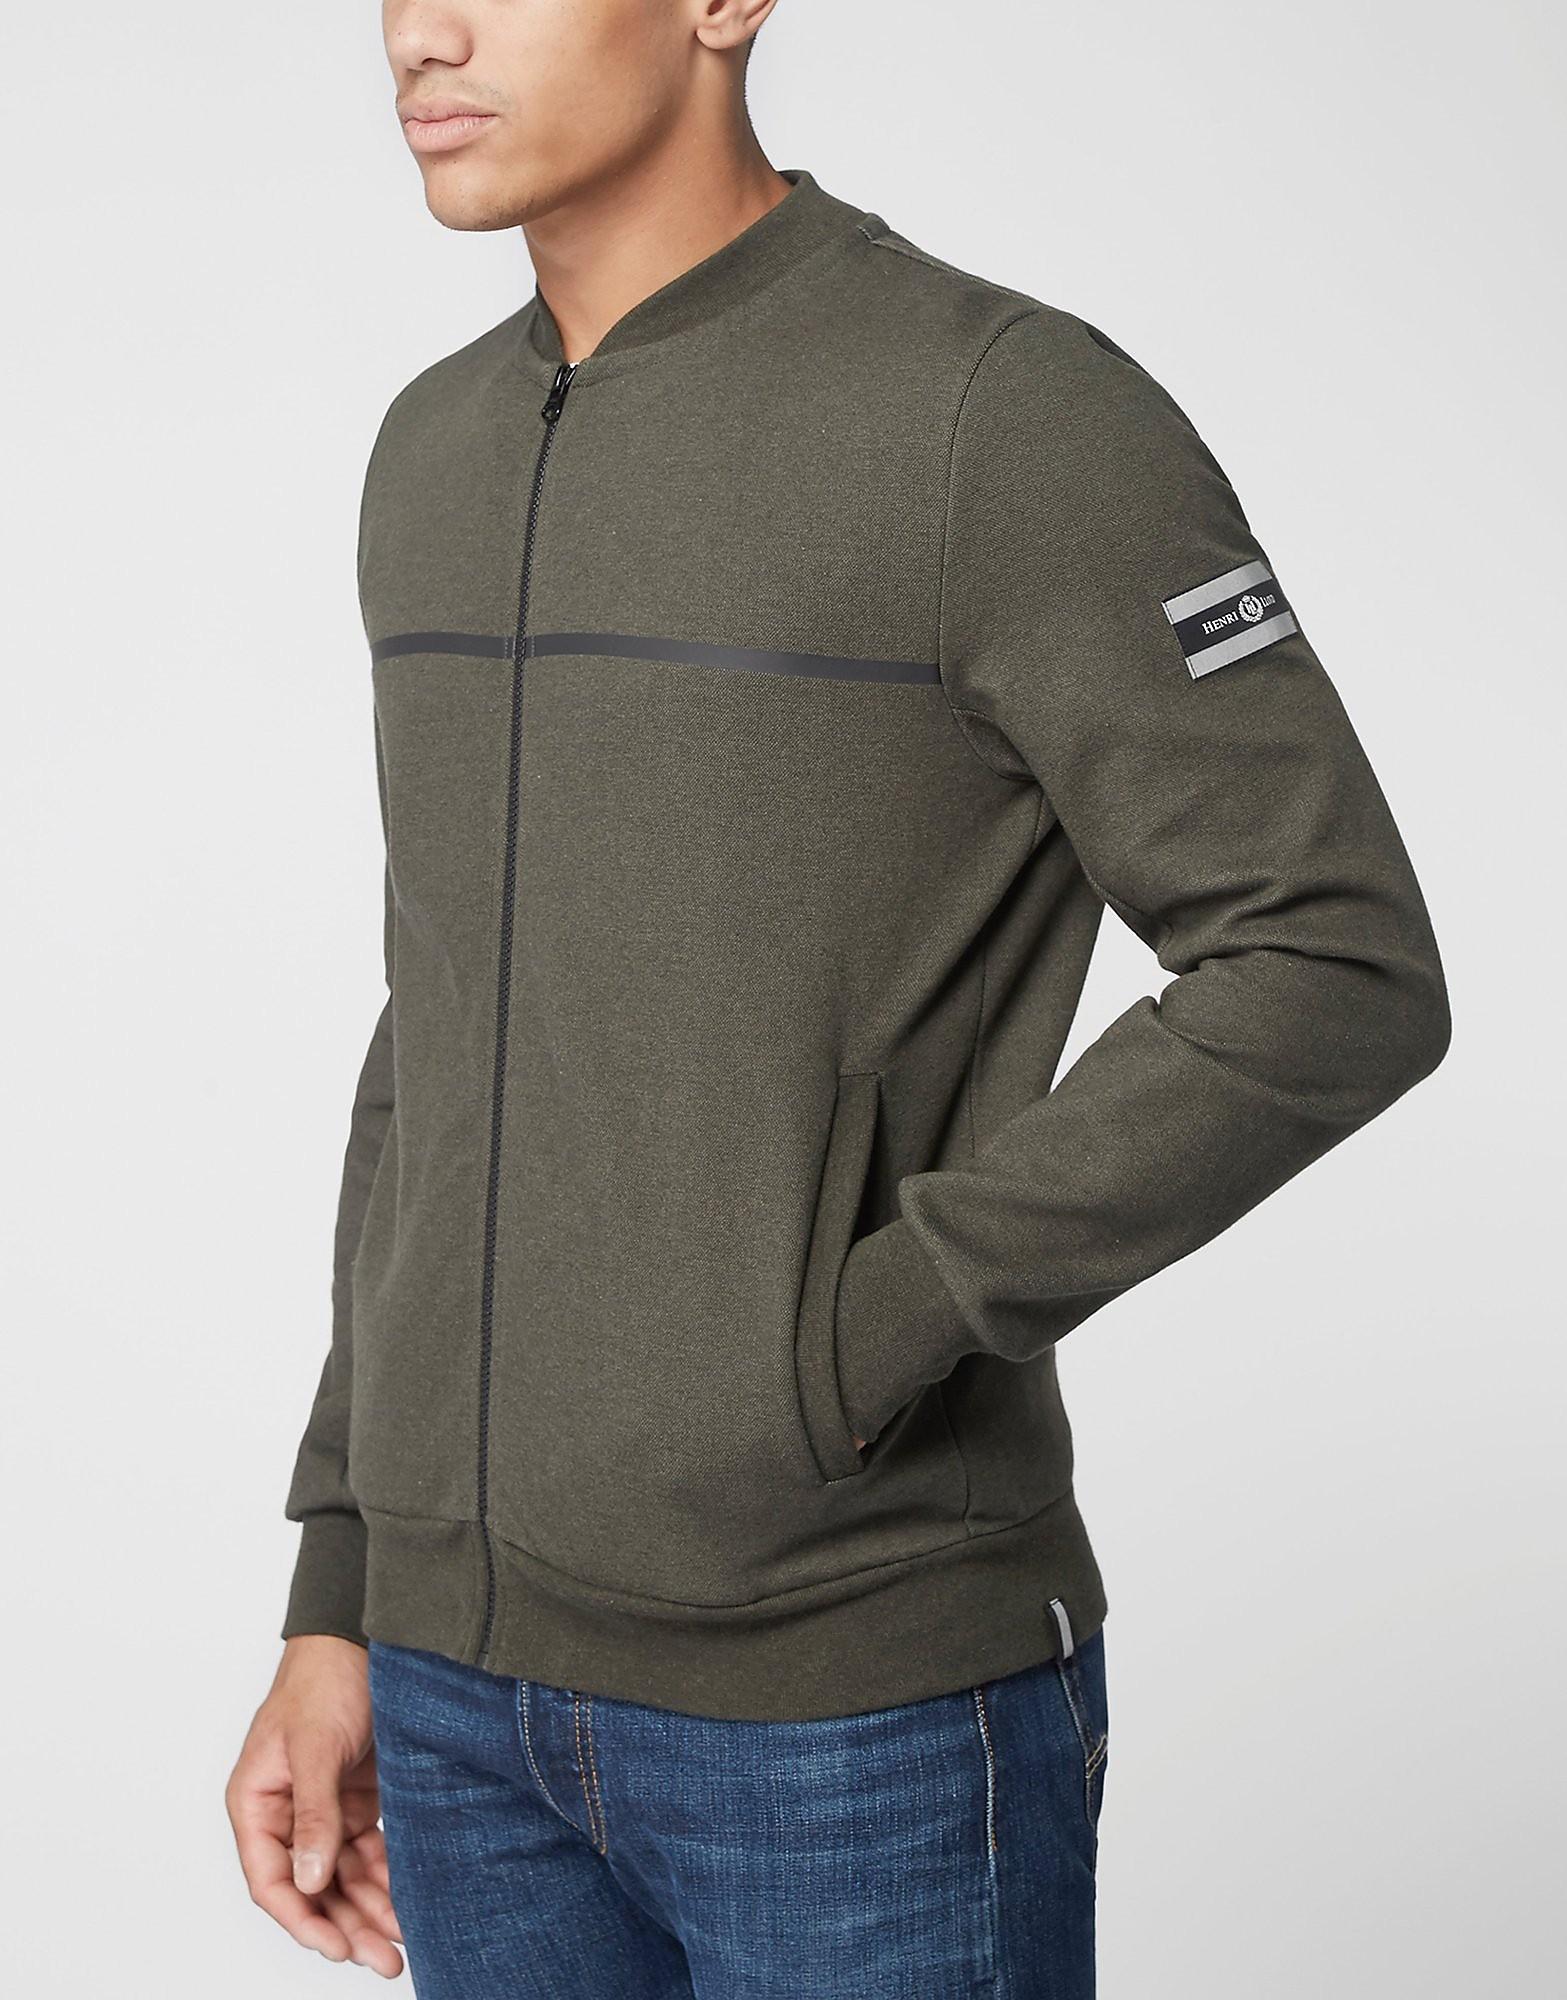 Henri Lloyd Brace Full Zip Sweatshirt